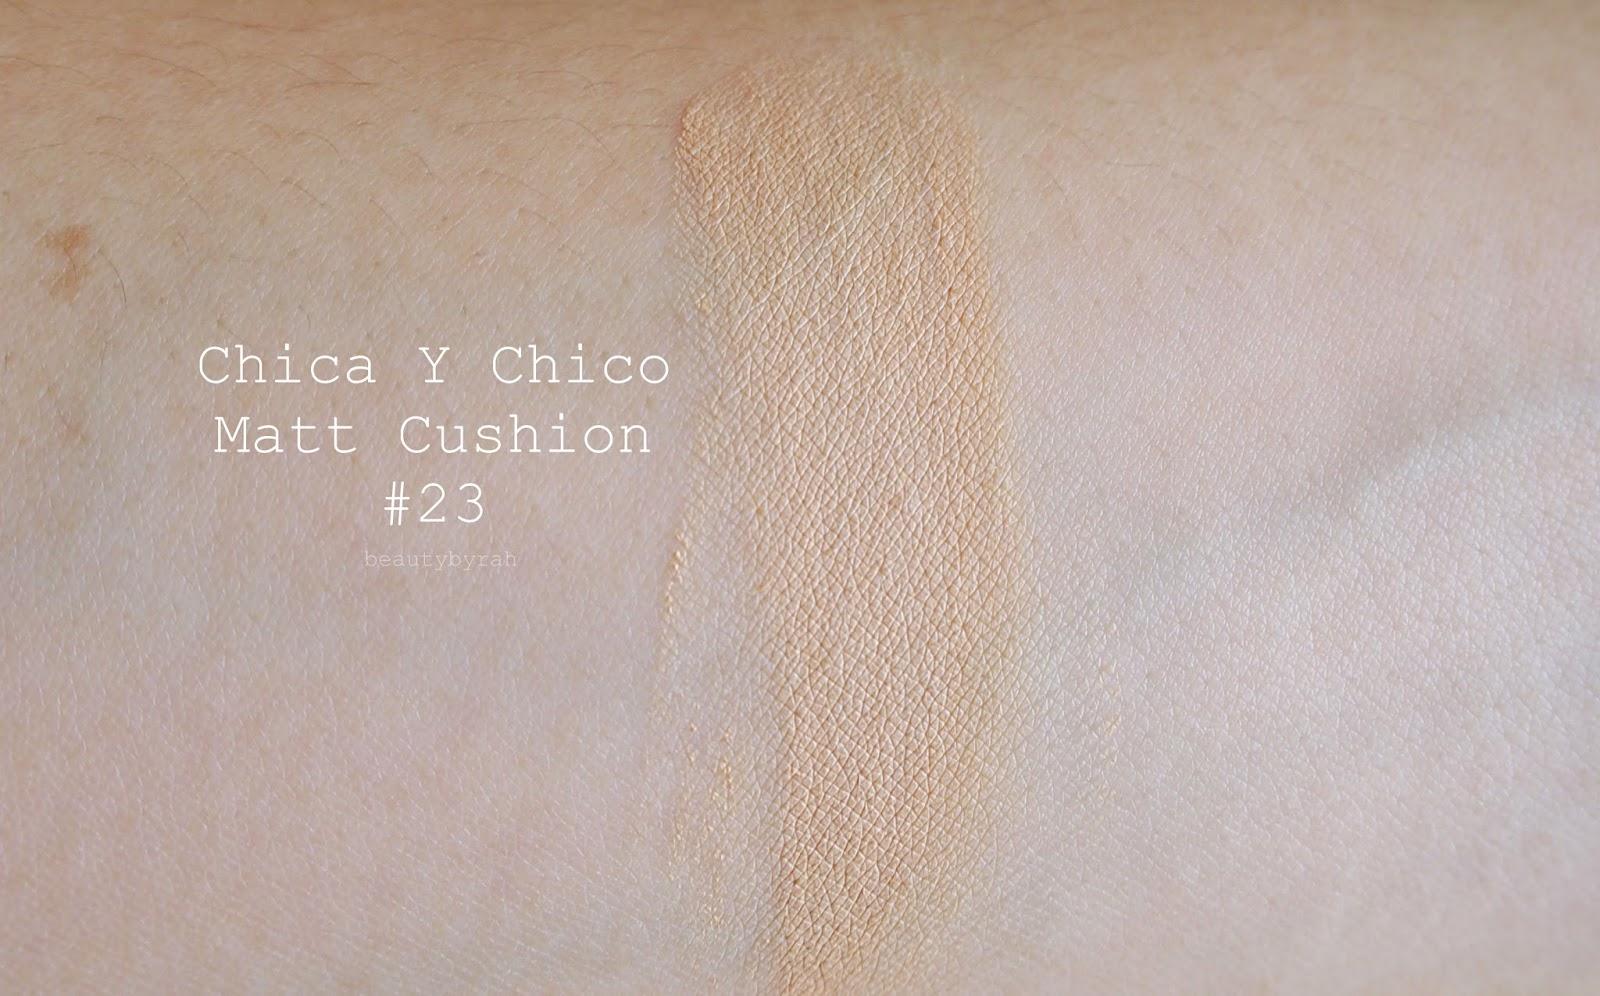 Chica Y Chico Matt Cushion 23 swatch